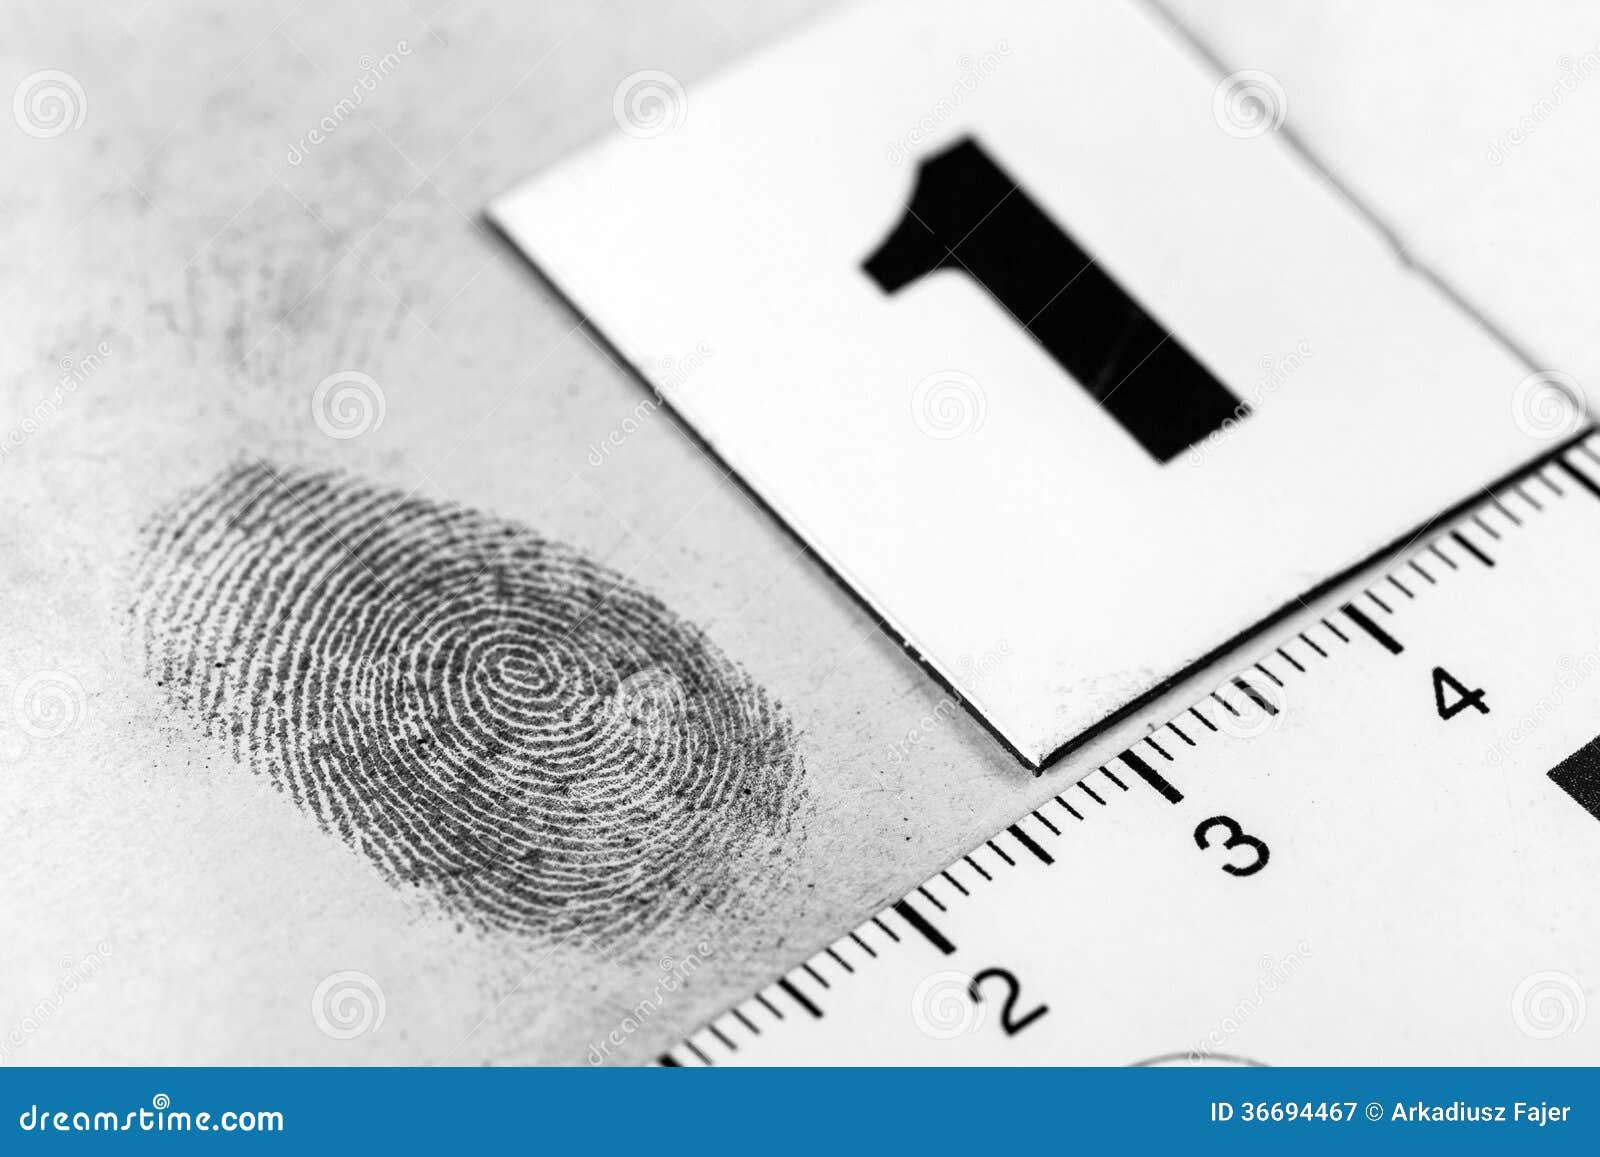 Fingerprint identificationthesis